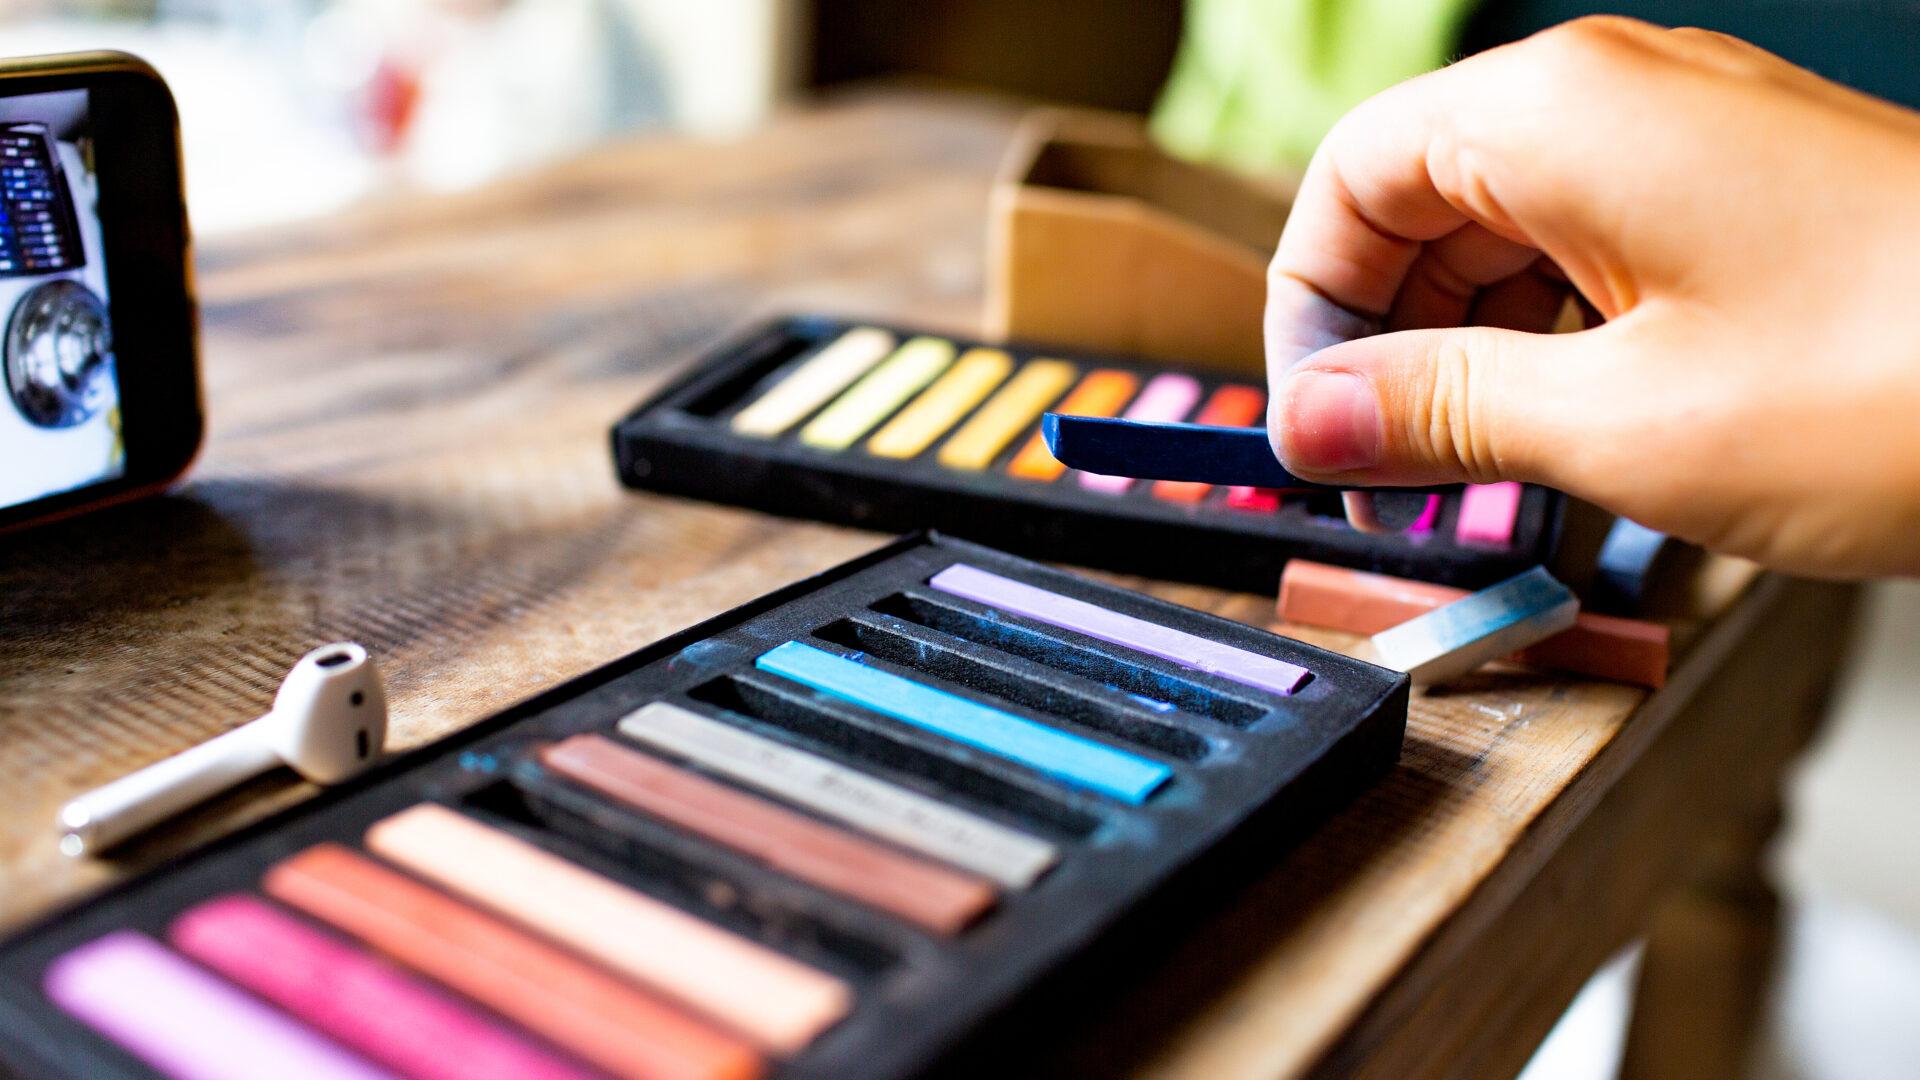 hand using pastels